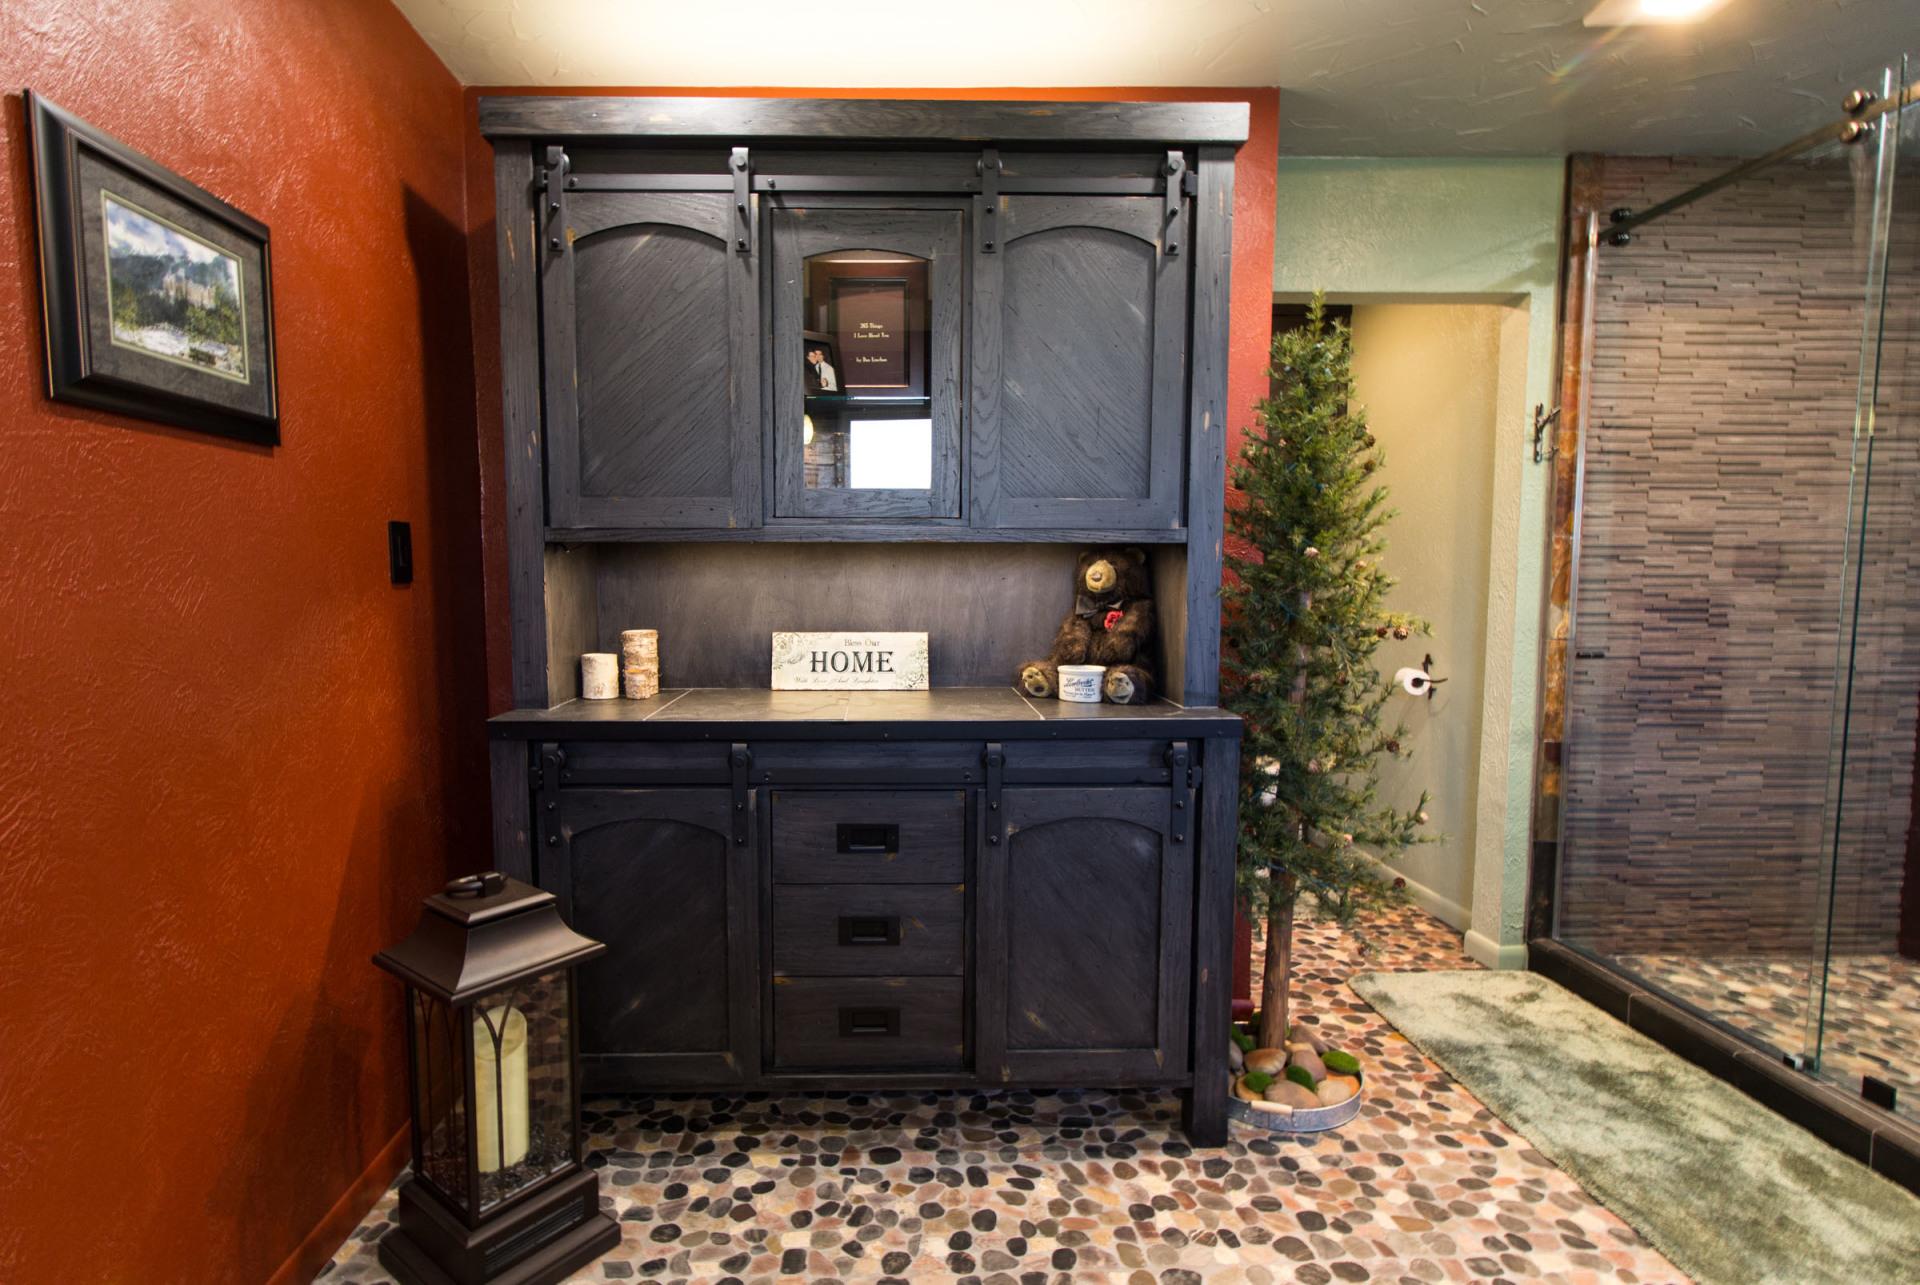 jarrell-signature-mountain-oasis-bathroom-remodel-7